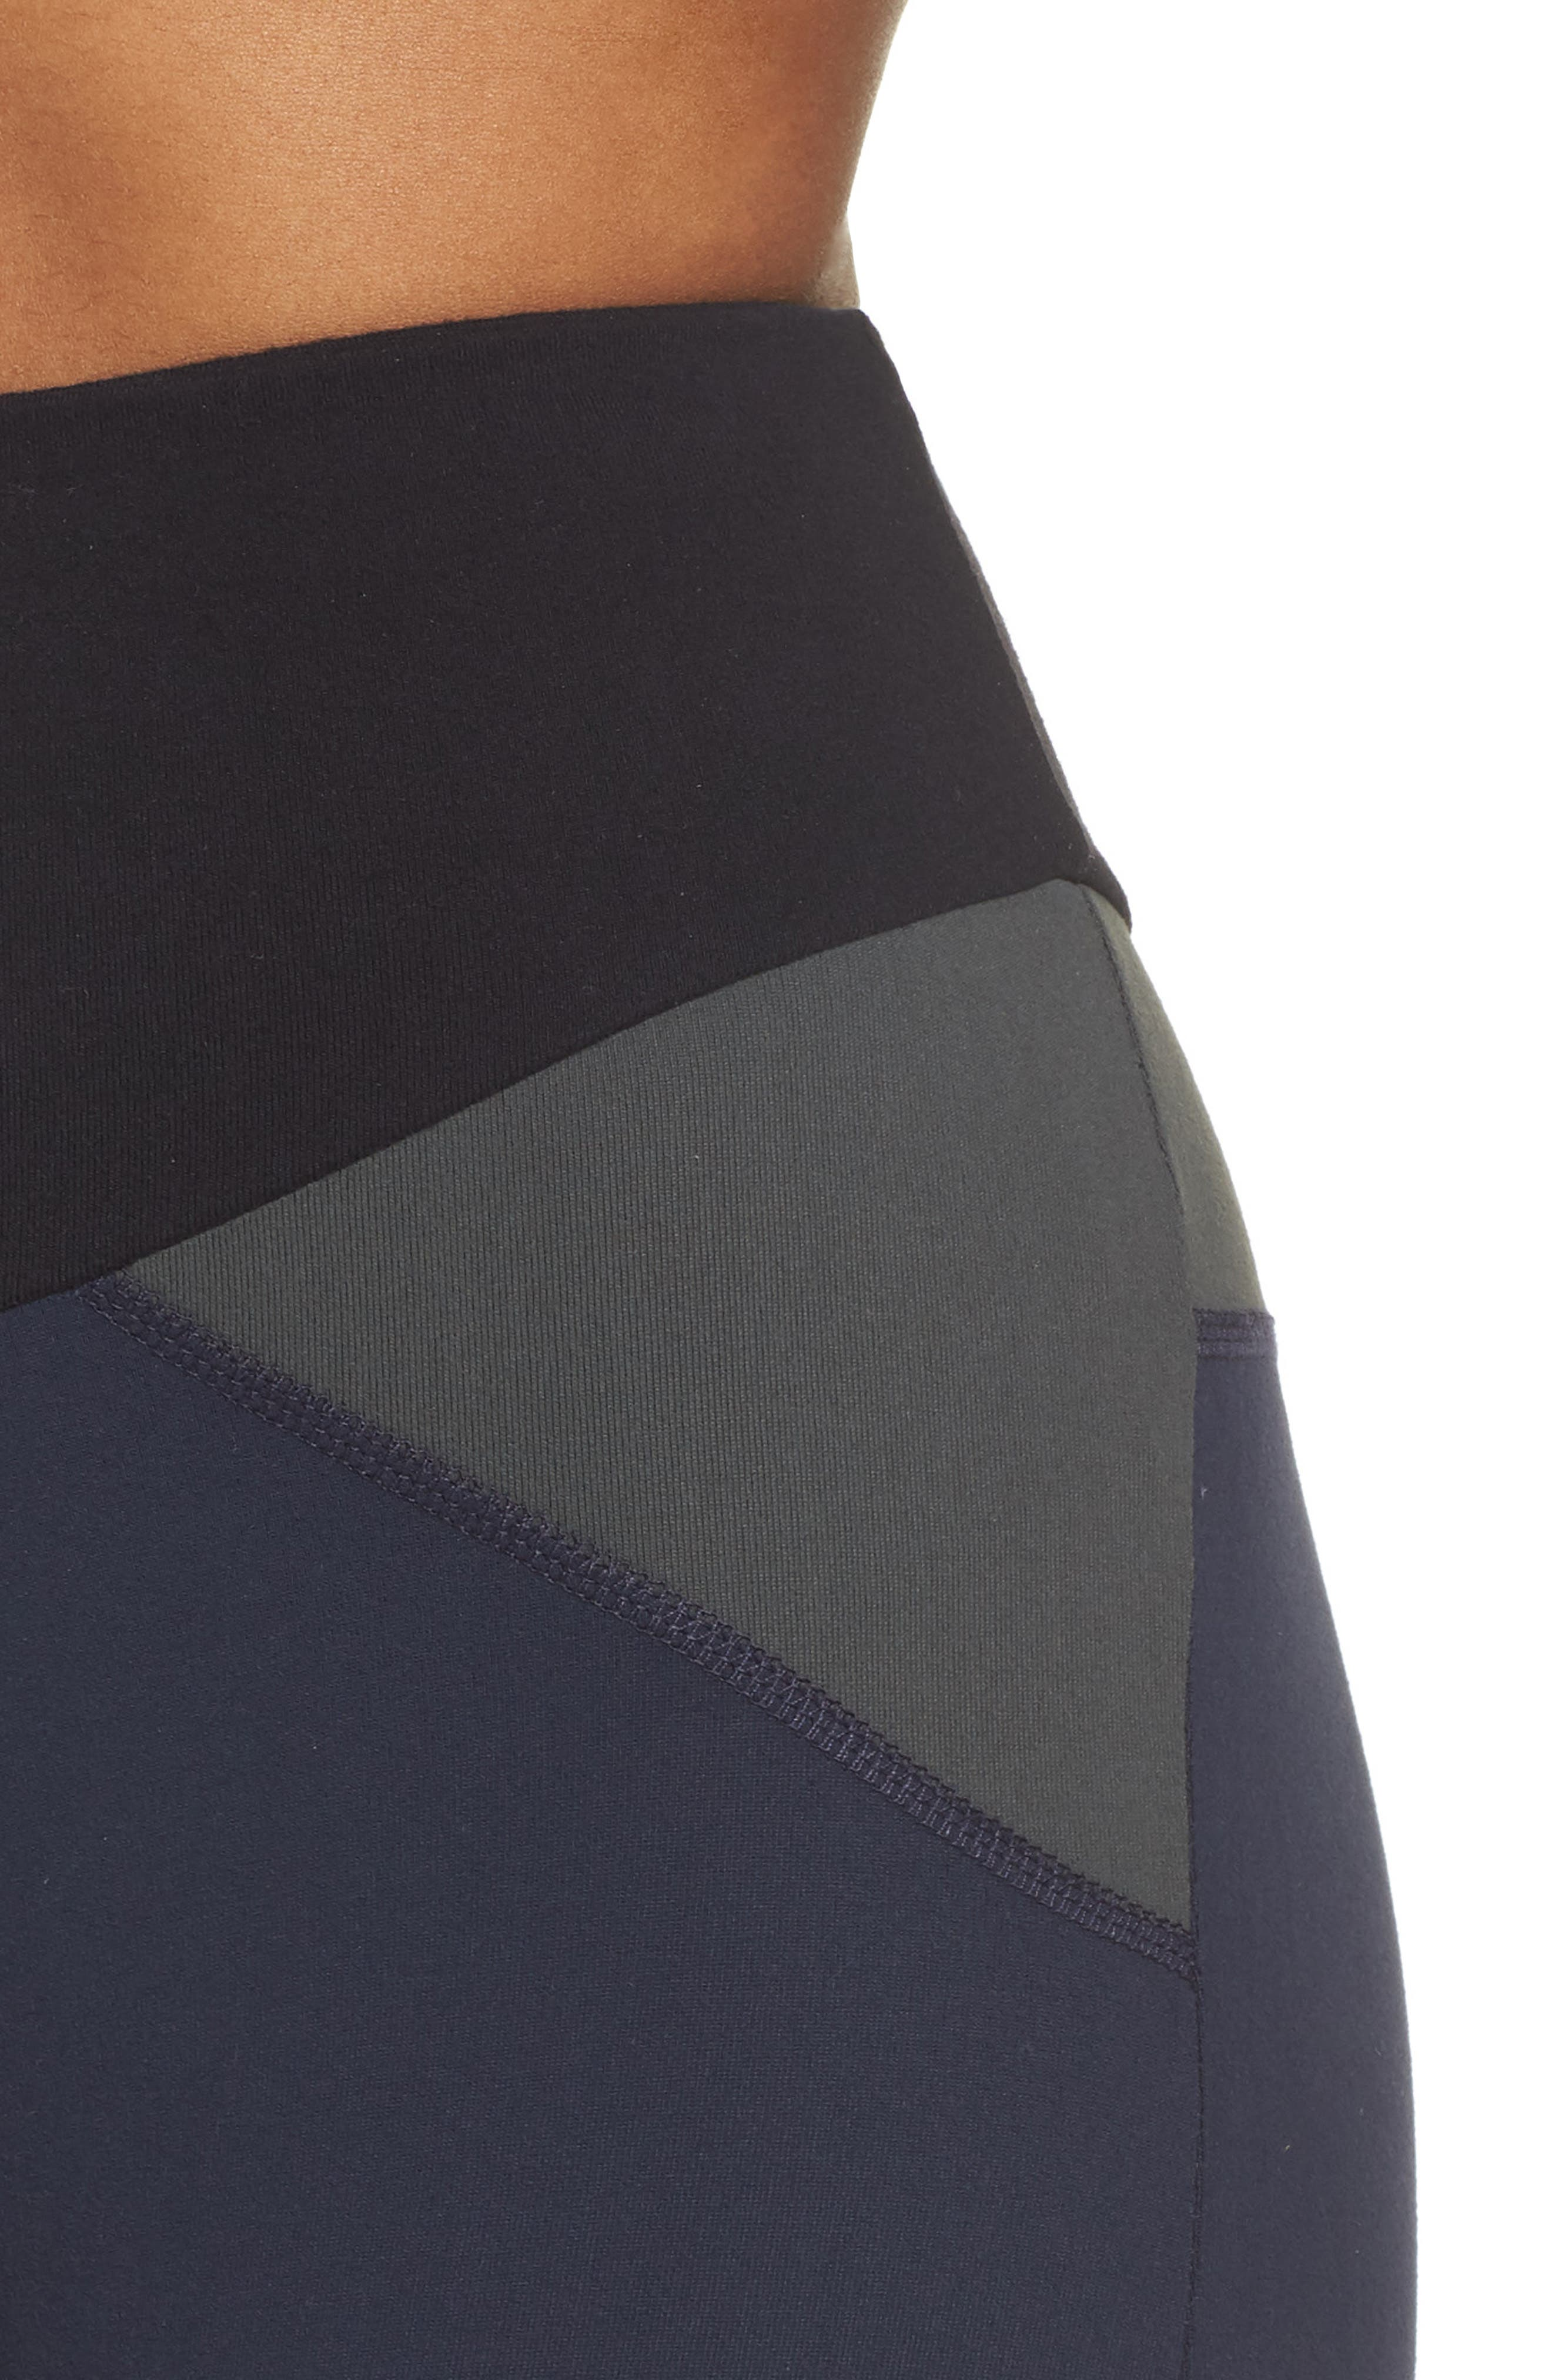 BoomBoom Athletica Brushed Tricolor Panel Leggings,                             Alternate thumbnail 4, color,                             NAVY/ BLACK/ GREEN